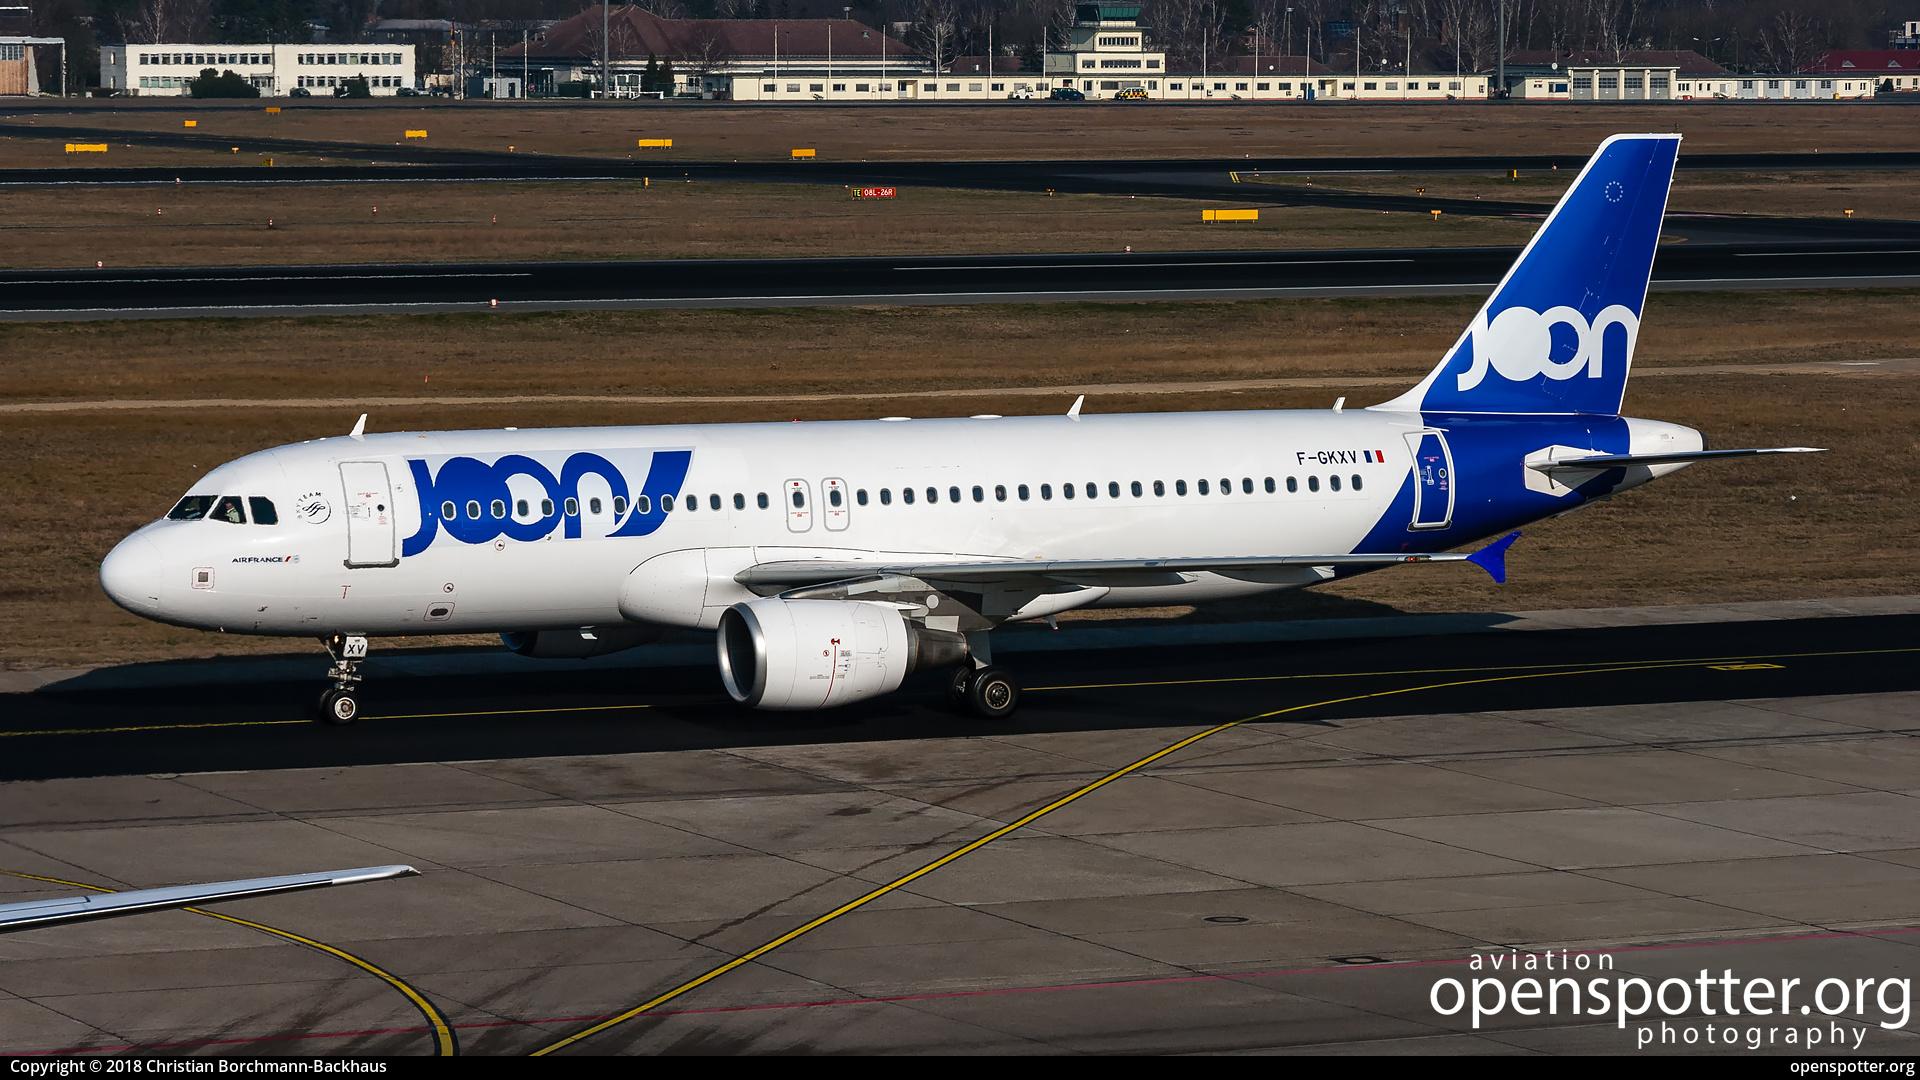 F-GKXV - Joon Airbus A320-214 at Berlin-Tegel Airport (TXL/EDDT) taken by Christian Borchmann-Backhaus | openspotter.org | ID: 51517